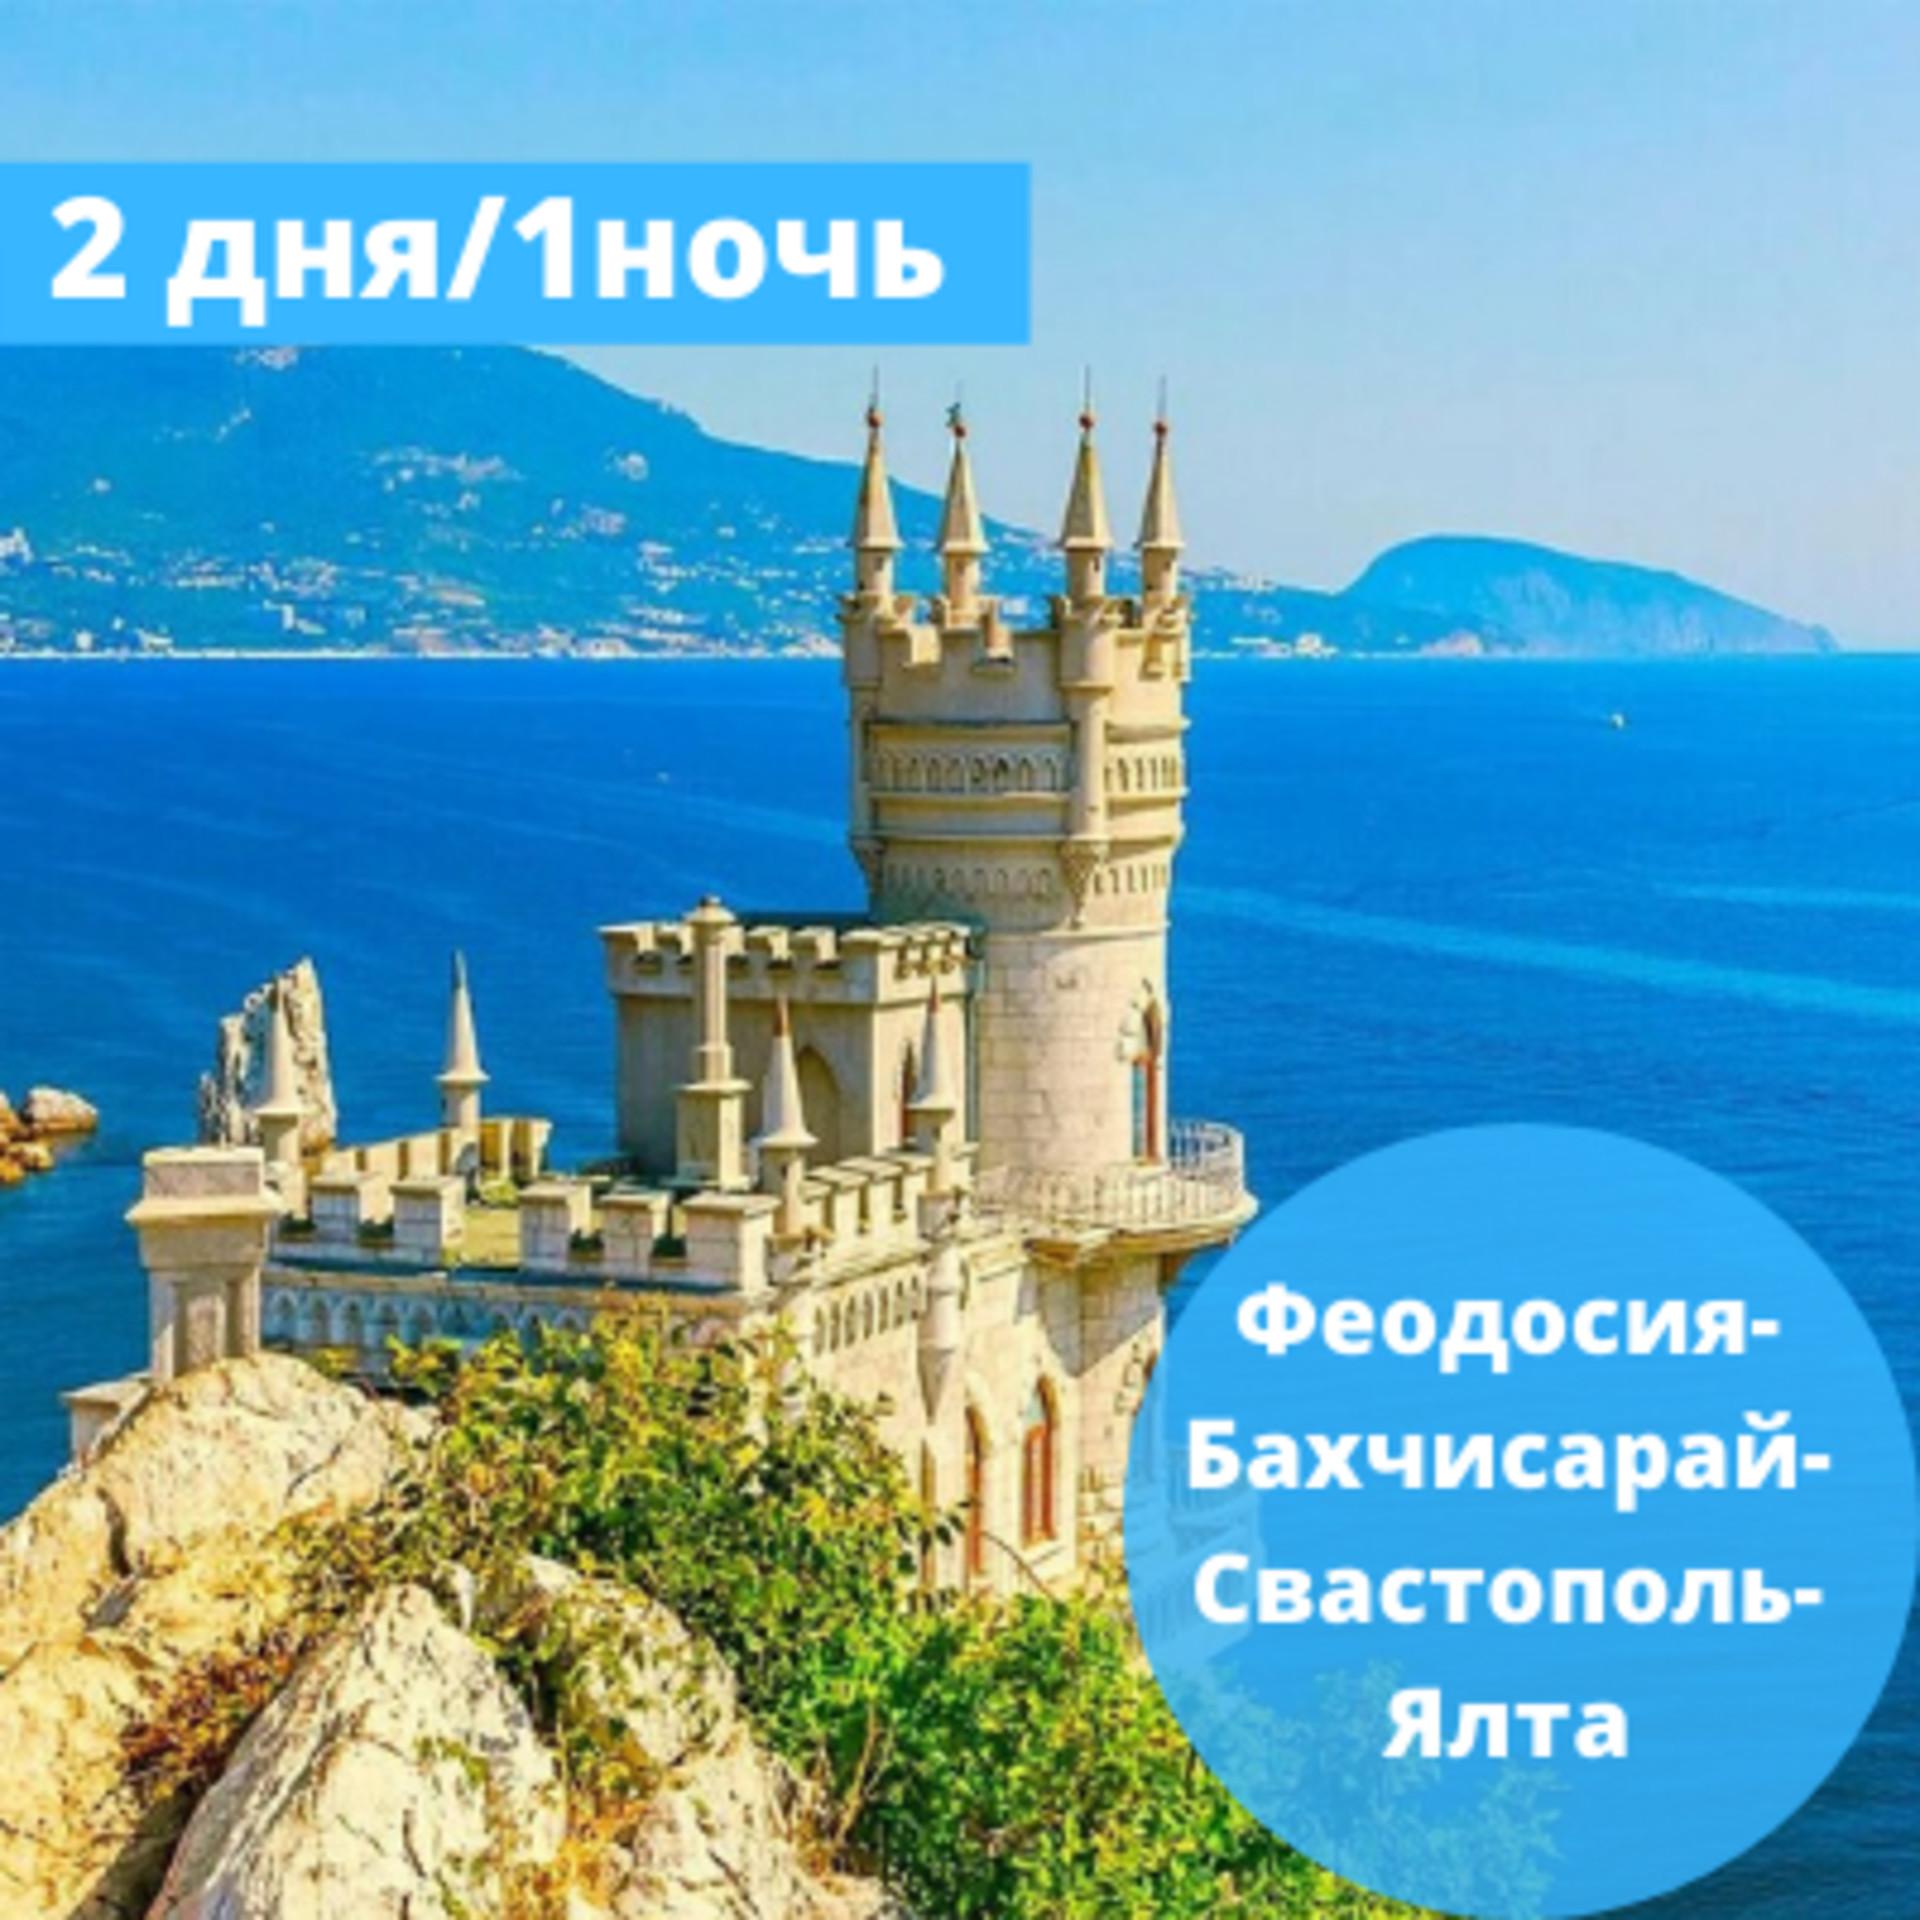 Феодосия-Бахчисарай-Свастополь-Ялта.png